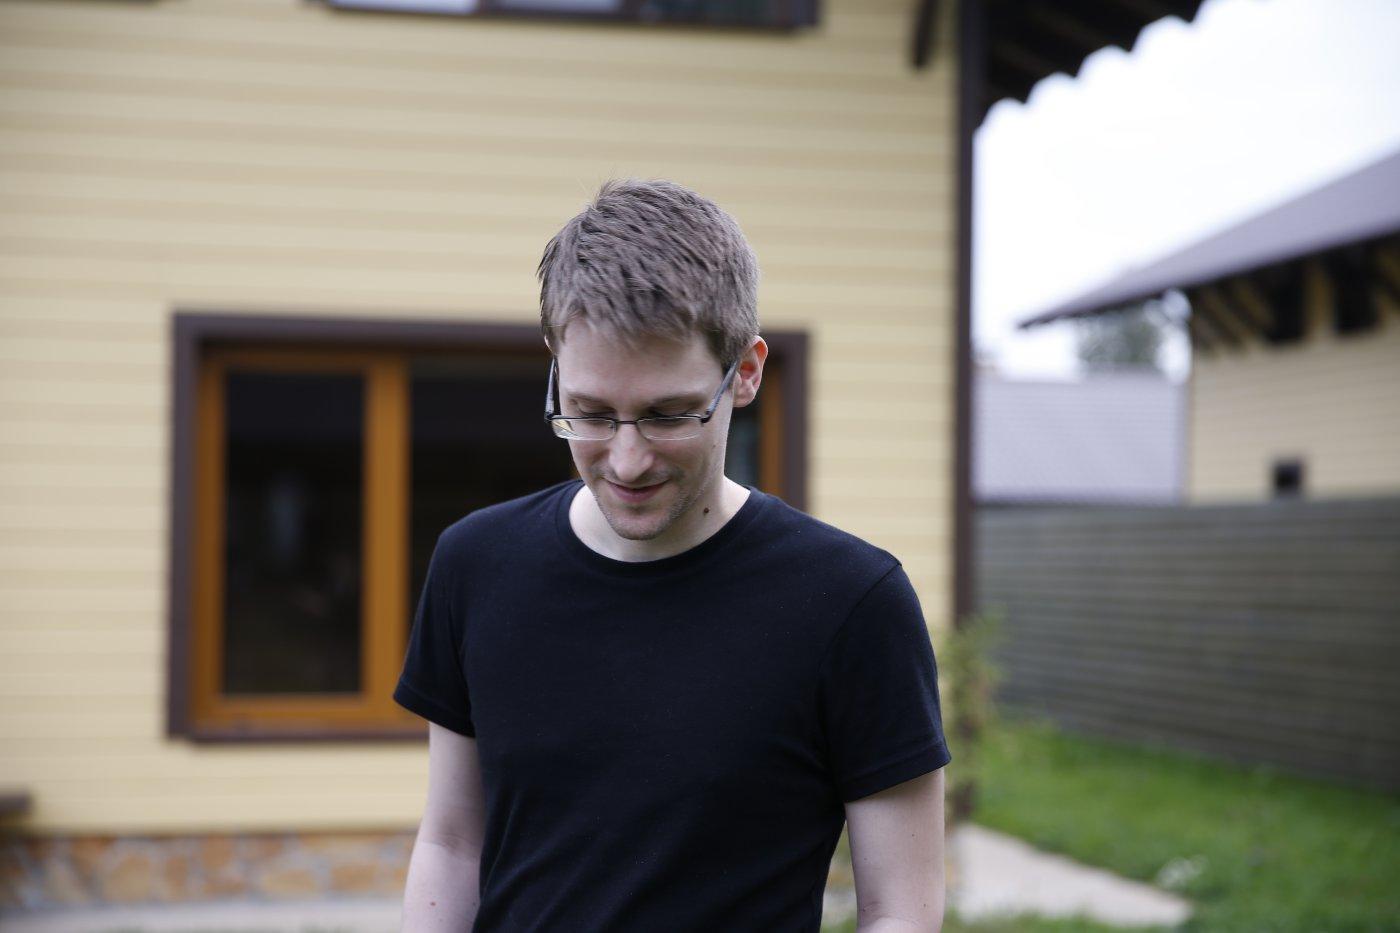 Edward Snowden em Citizenfour (photo by outnow.ch)